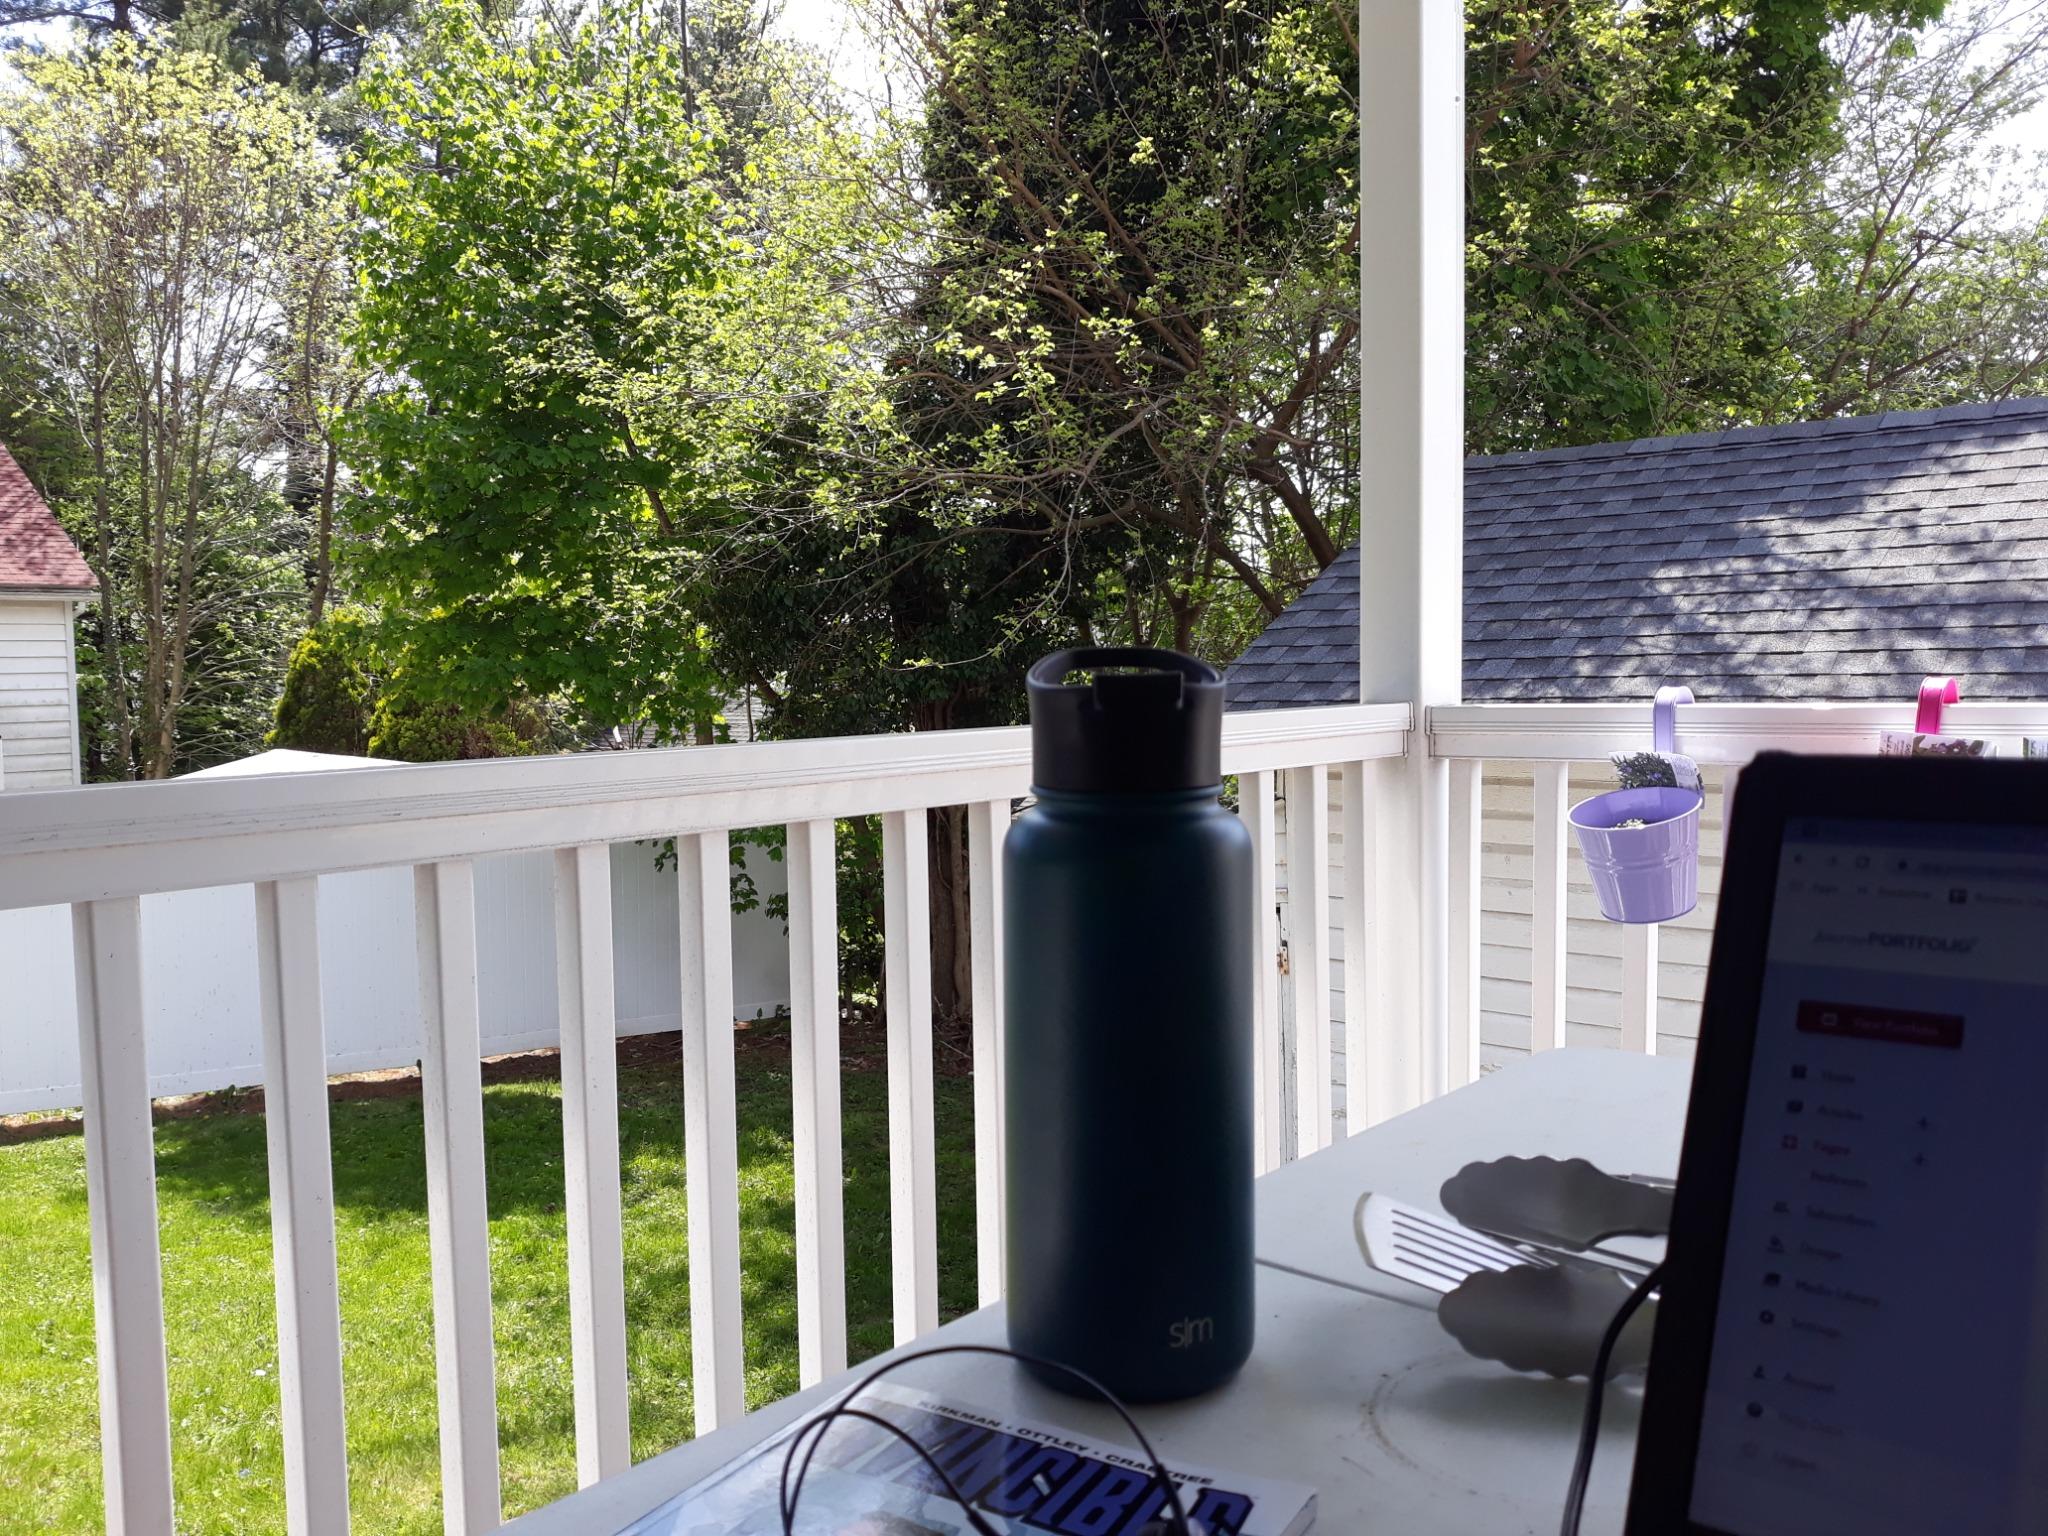 Benny Regalbuto's porch and backyard